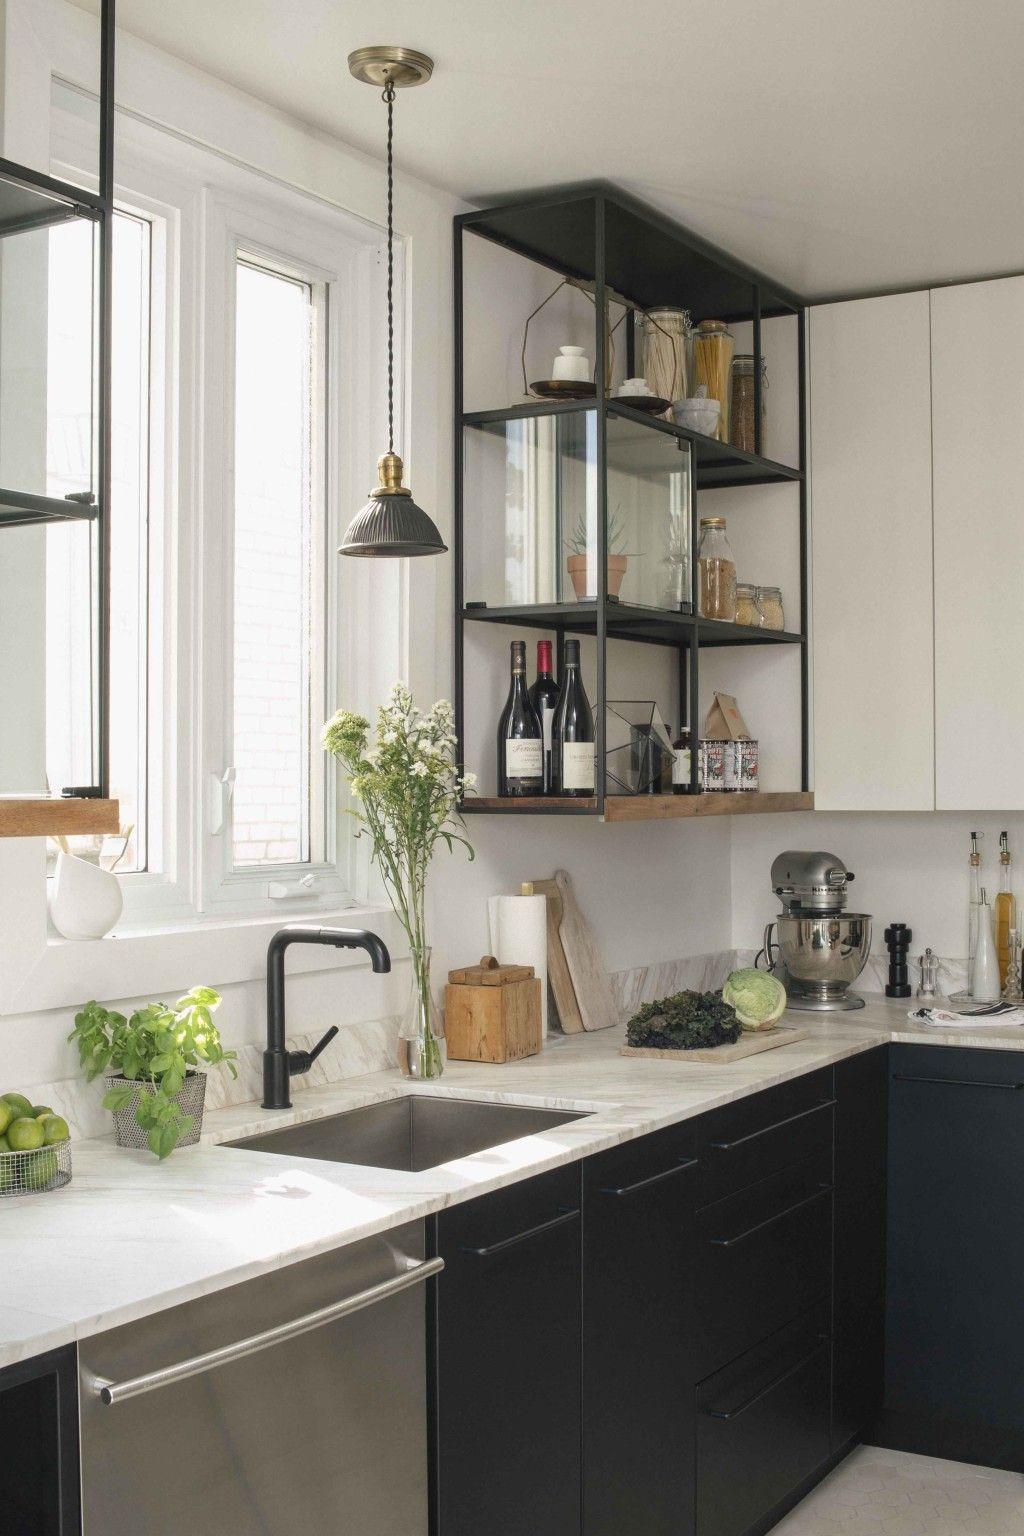 black bottom kitchen cabinets - Google Search  Cuisine ikea